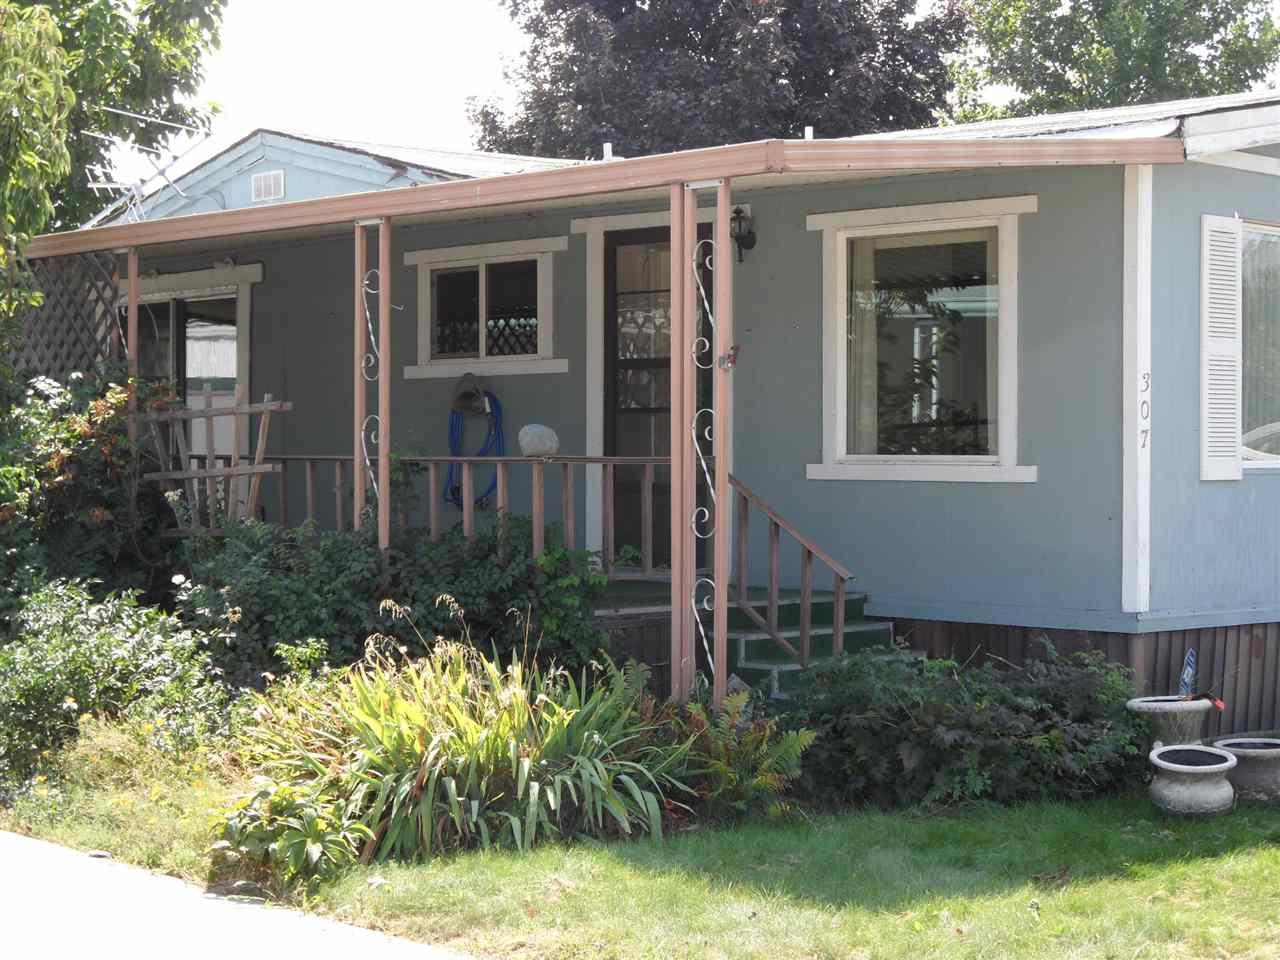 307 Driftwood,Boise,Idaho 83713,2 Bedrooms Bedrooms,2 BathroomsBathrooms,Residential,307 Driftwood,98668755